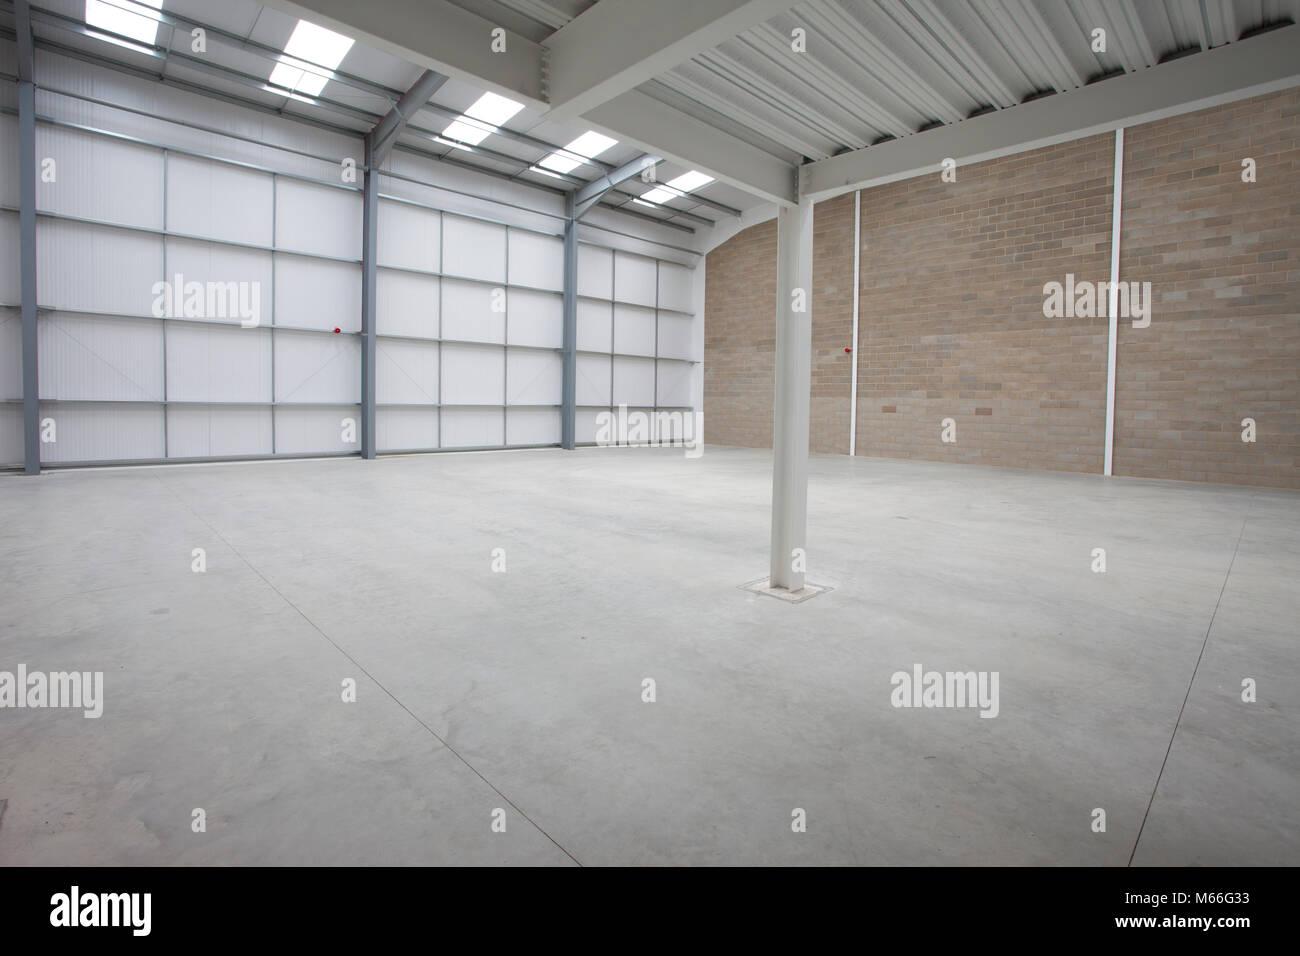 warehouse interior new build modern construction. Warehousing steel ...